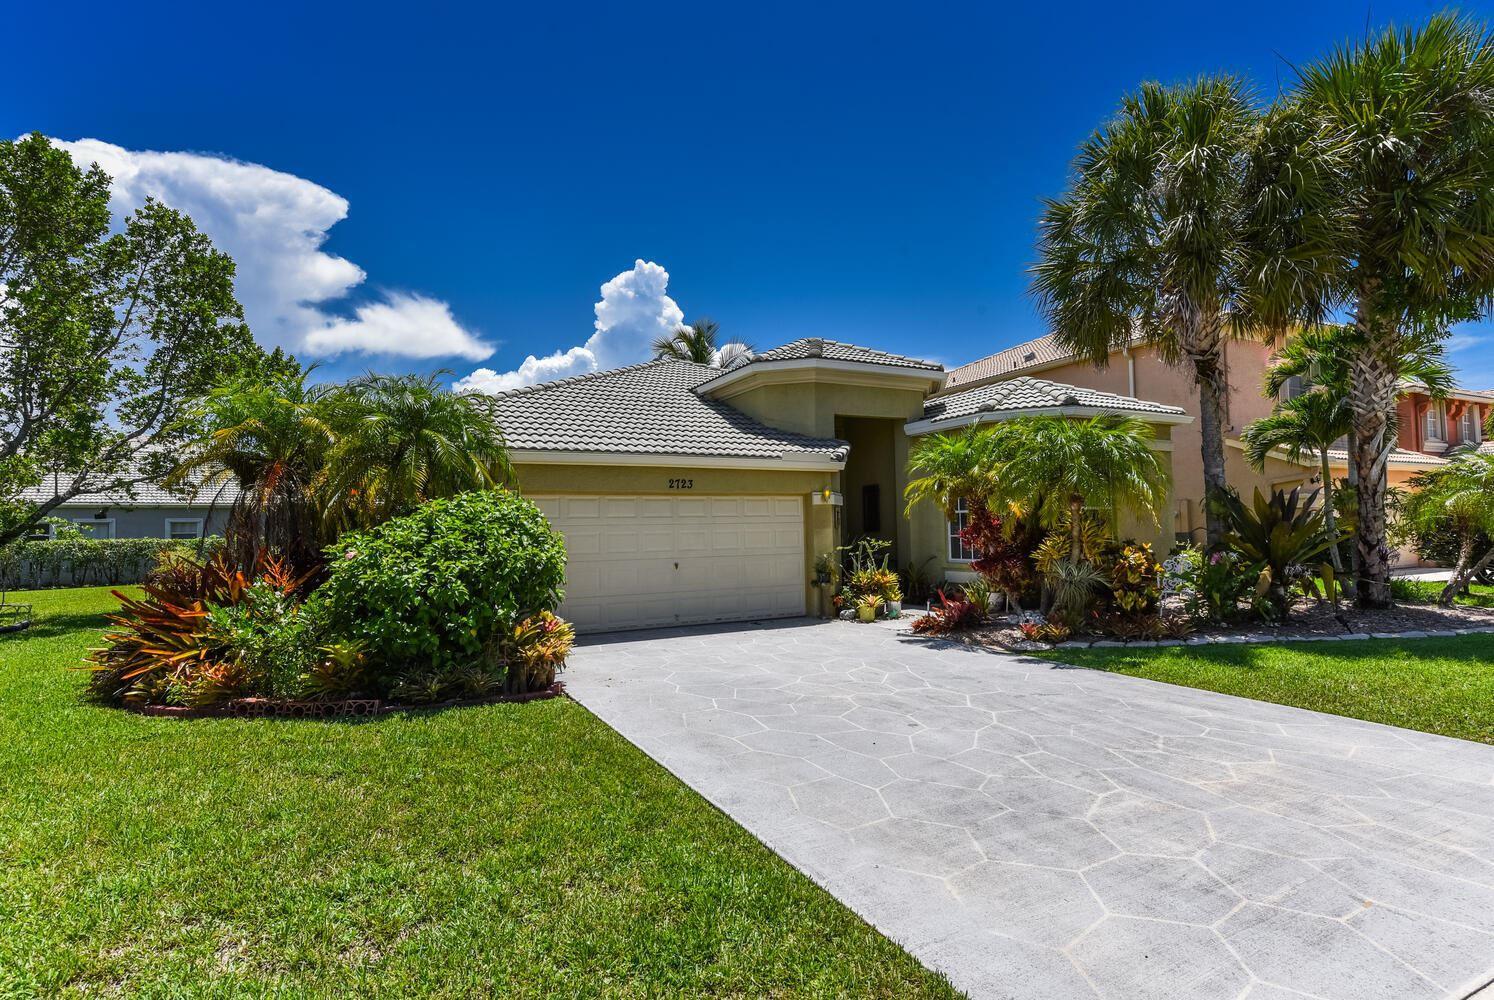 2723 Misty Oaks Circle, Royal Palm Beach, FL 33411 - MLS#: RX-10727369